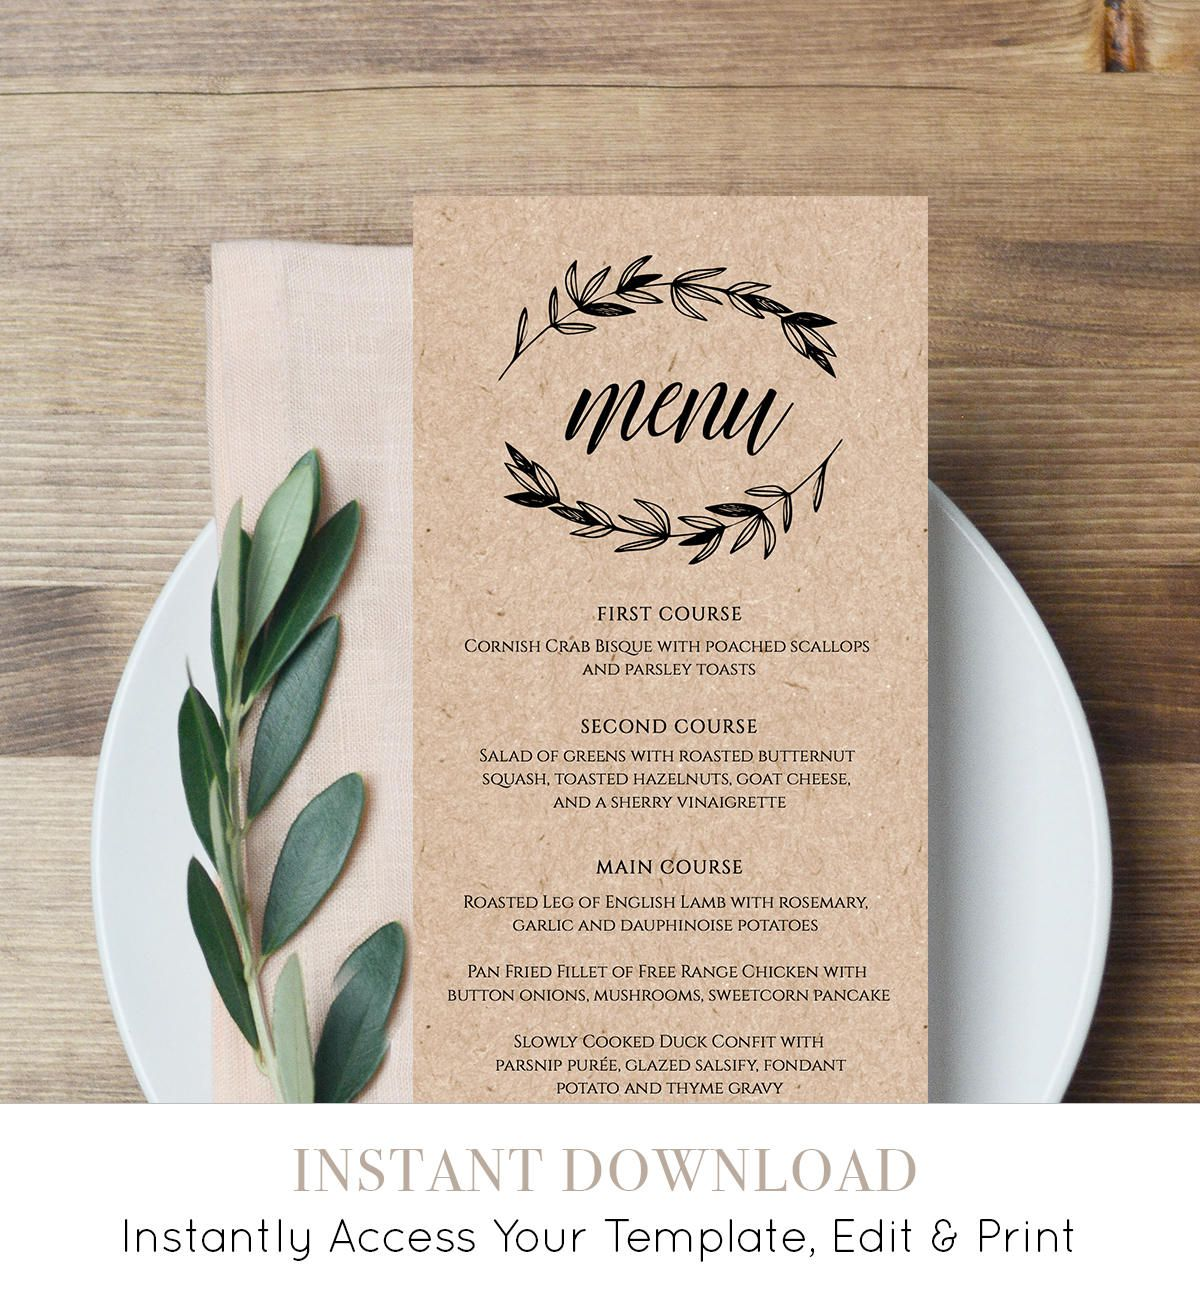 005 Marvelou Menu Card Template Free Download Example  Indian Restaurant Design CafeFull